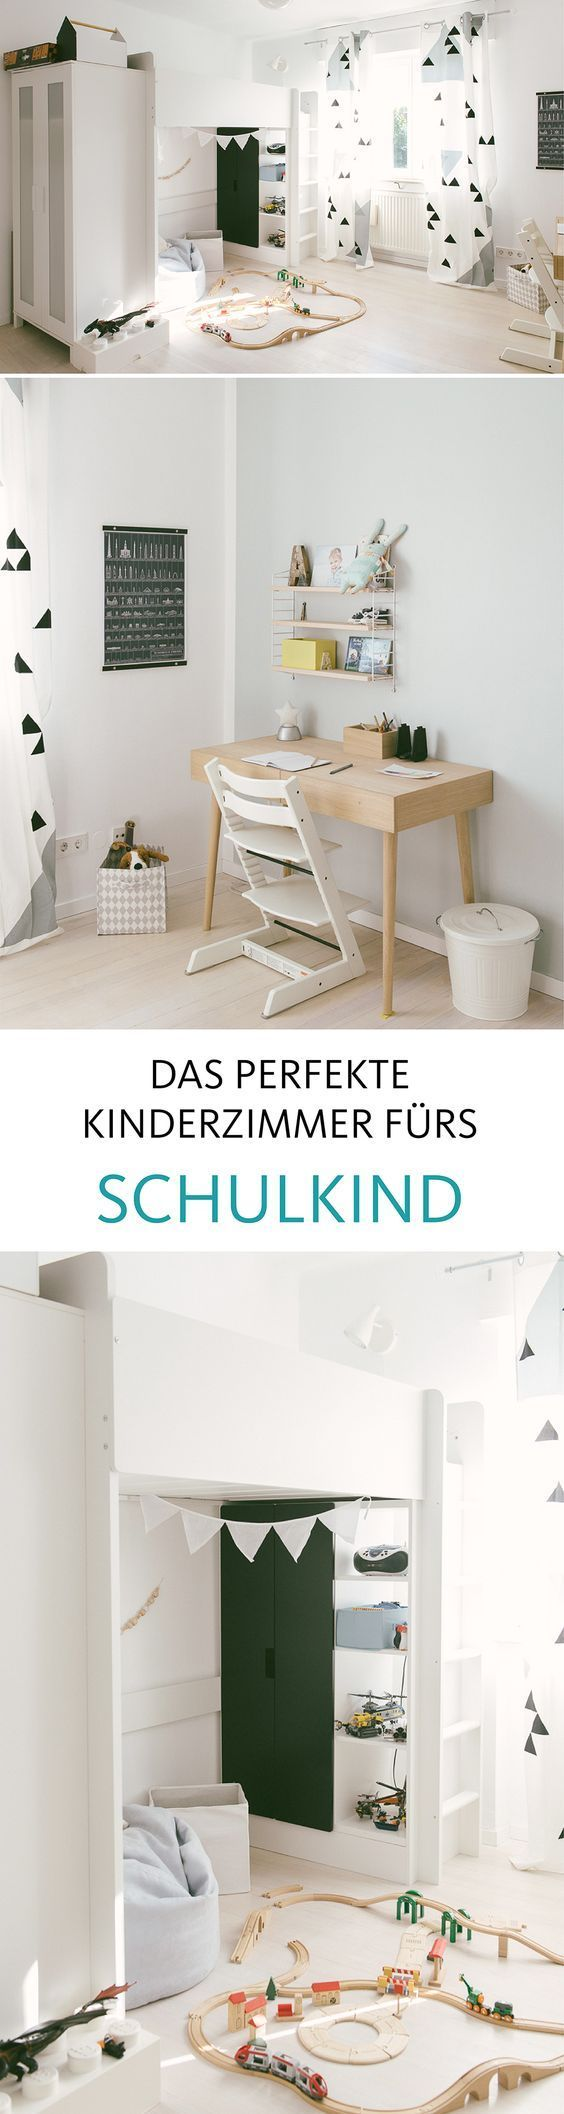 870 best Babyzimmer/Kinderzimmer images on Pinterest | Child room ...